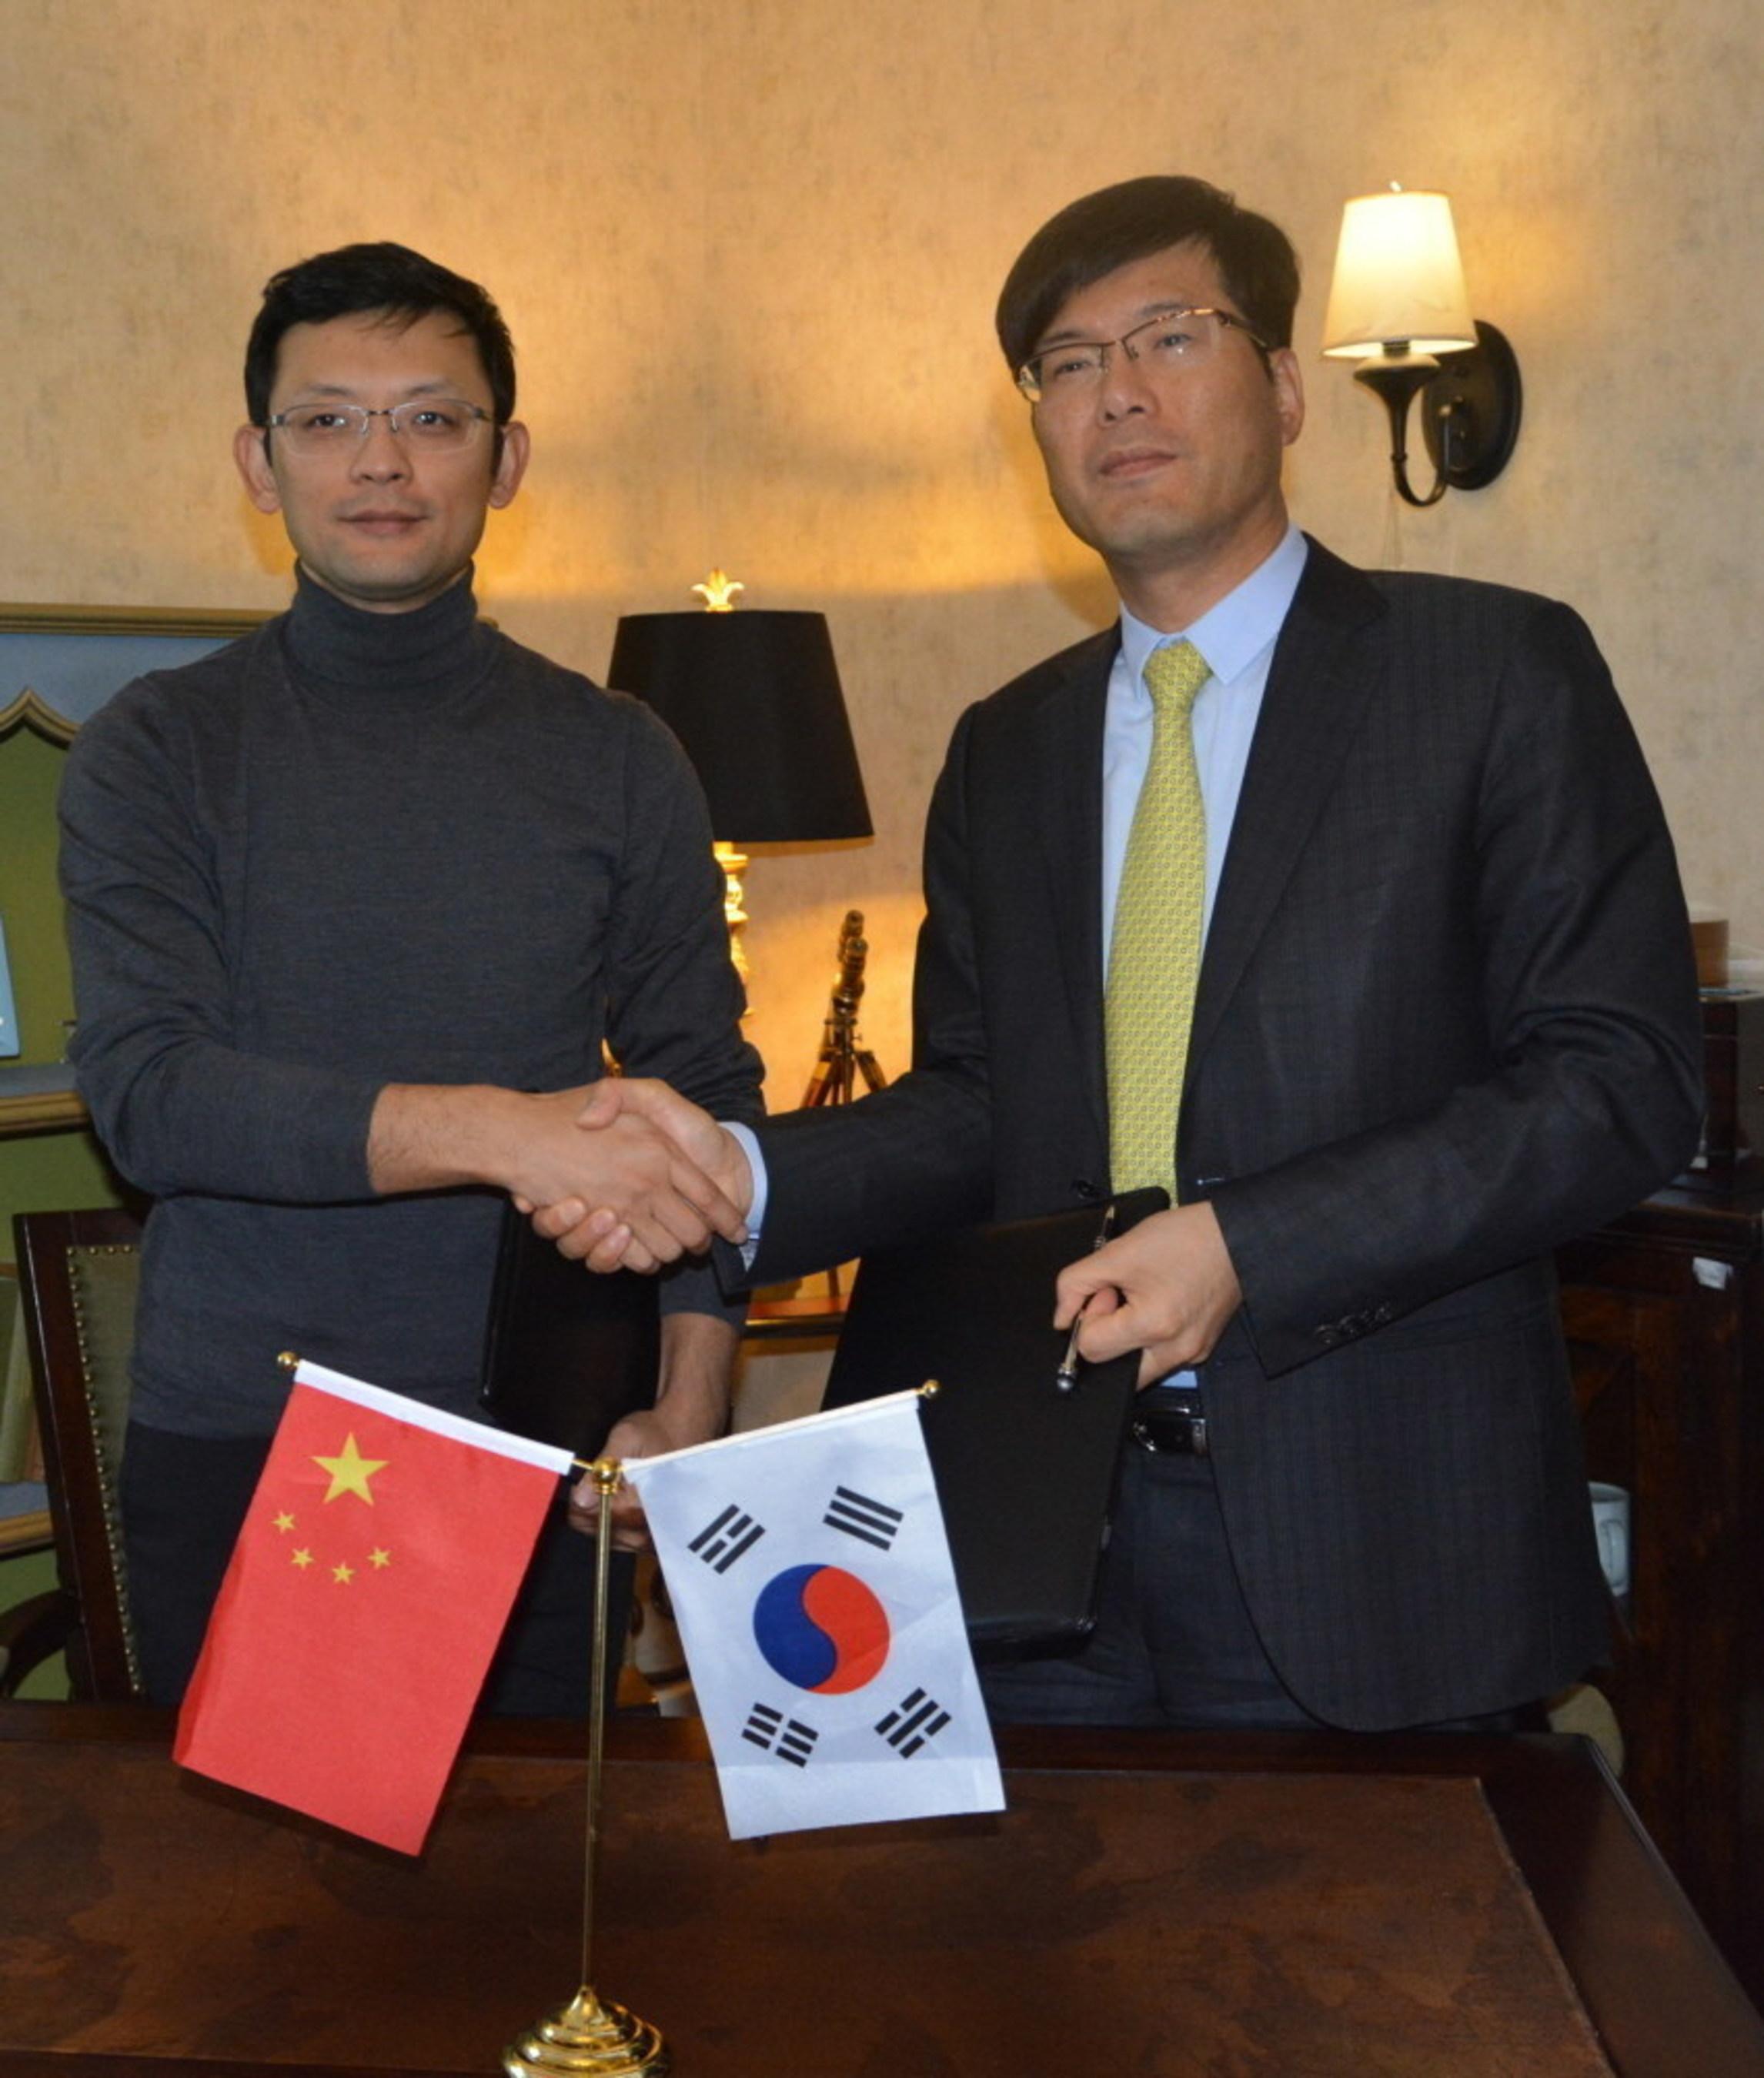 Ge Ke, Kingsoft CEO, left, and Lucas Ji, Systran International President, right